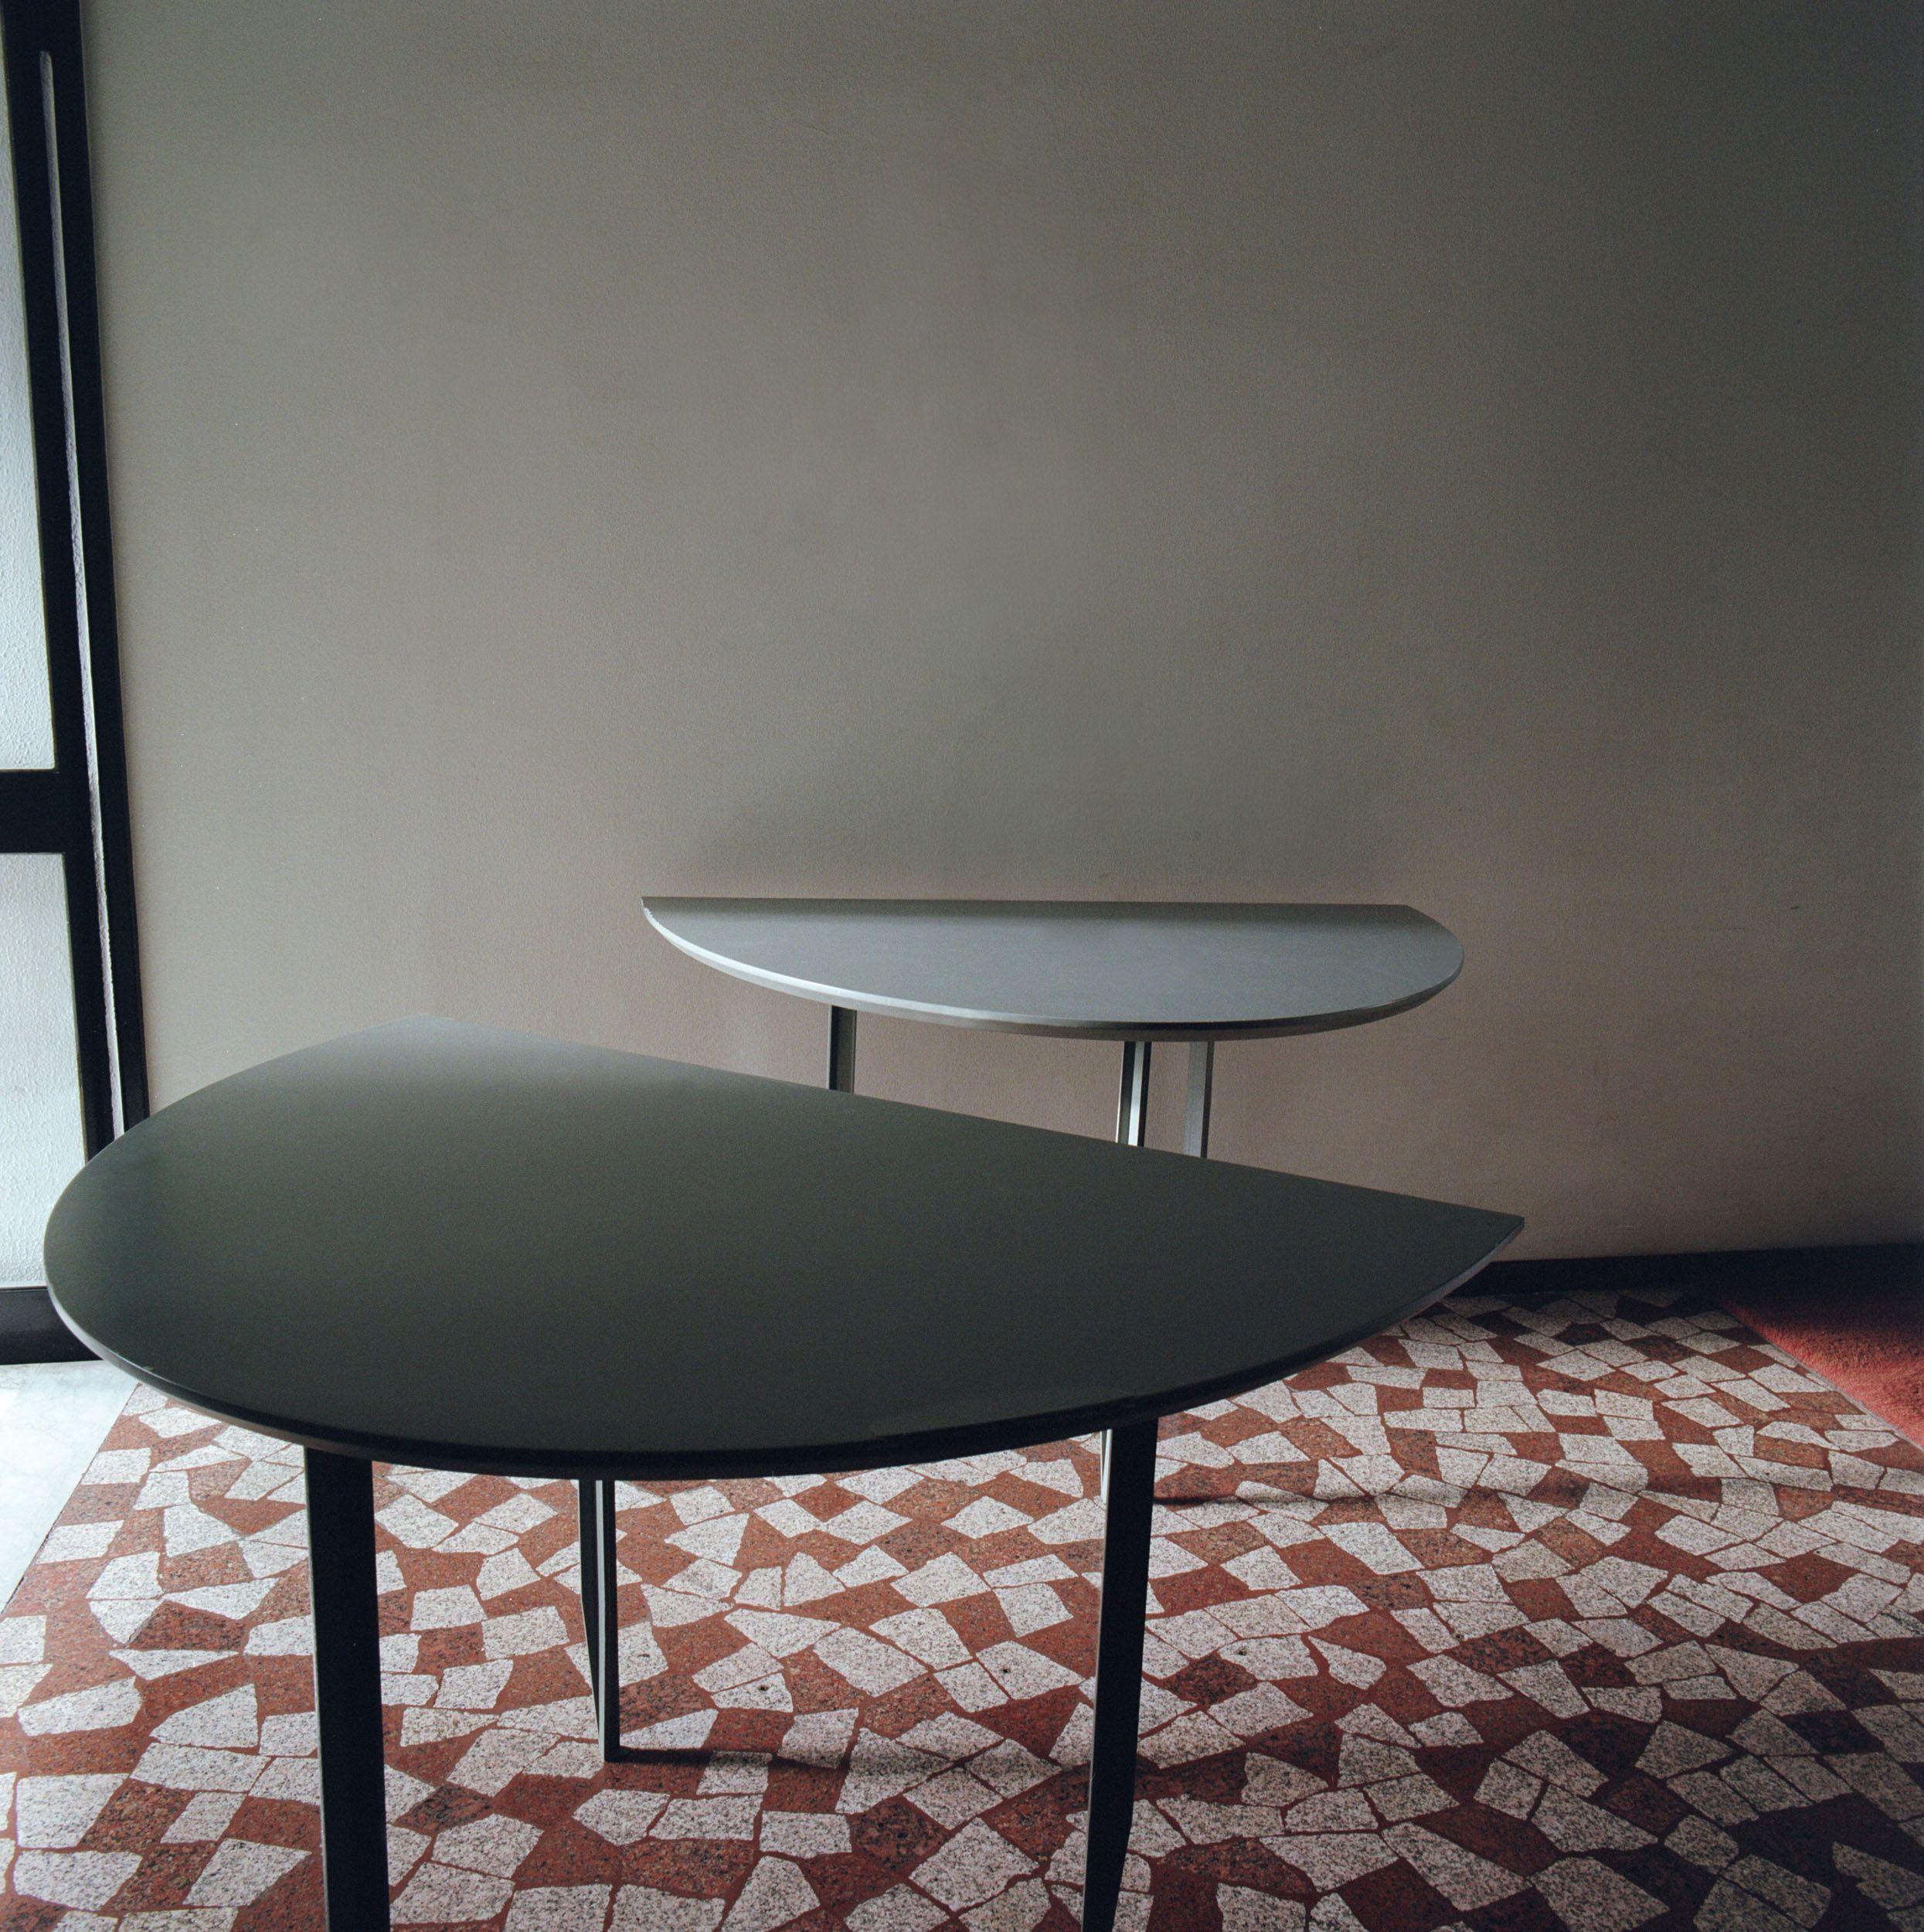 Sillabe Luca Baroni Furniture Table 11